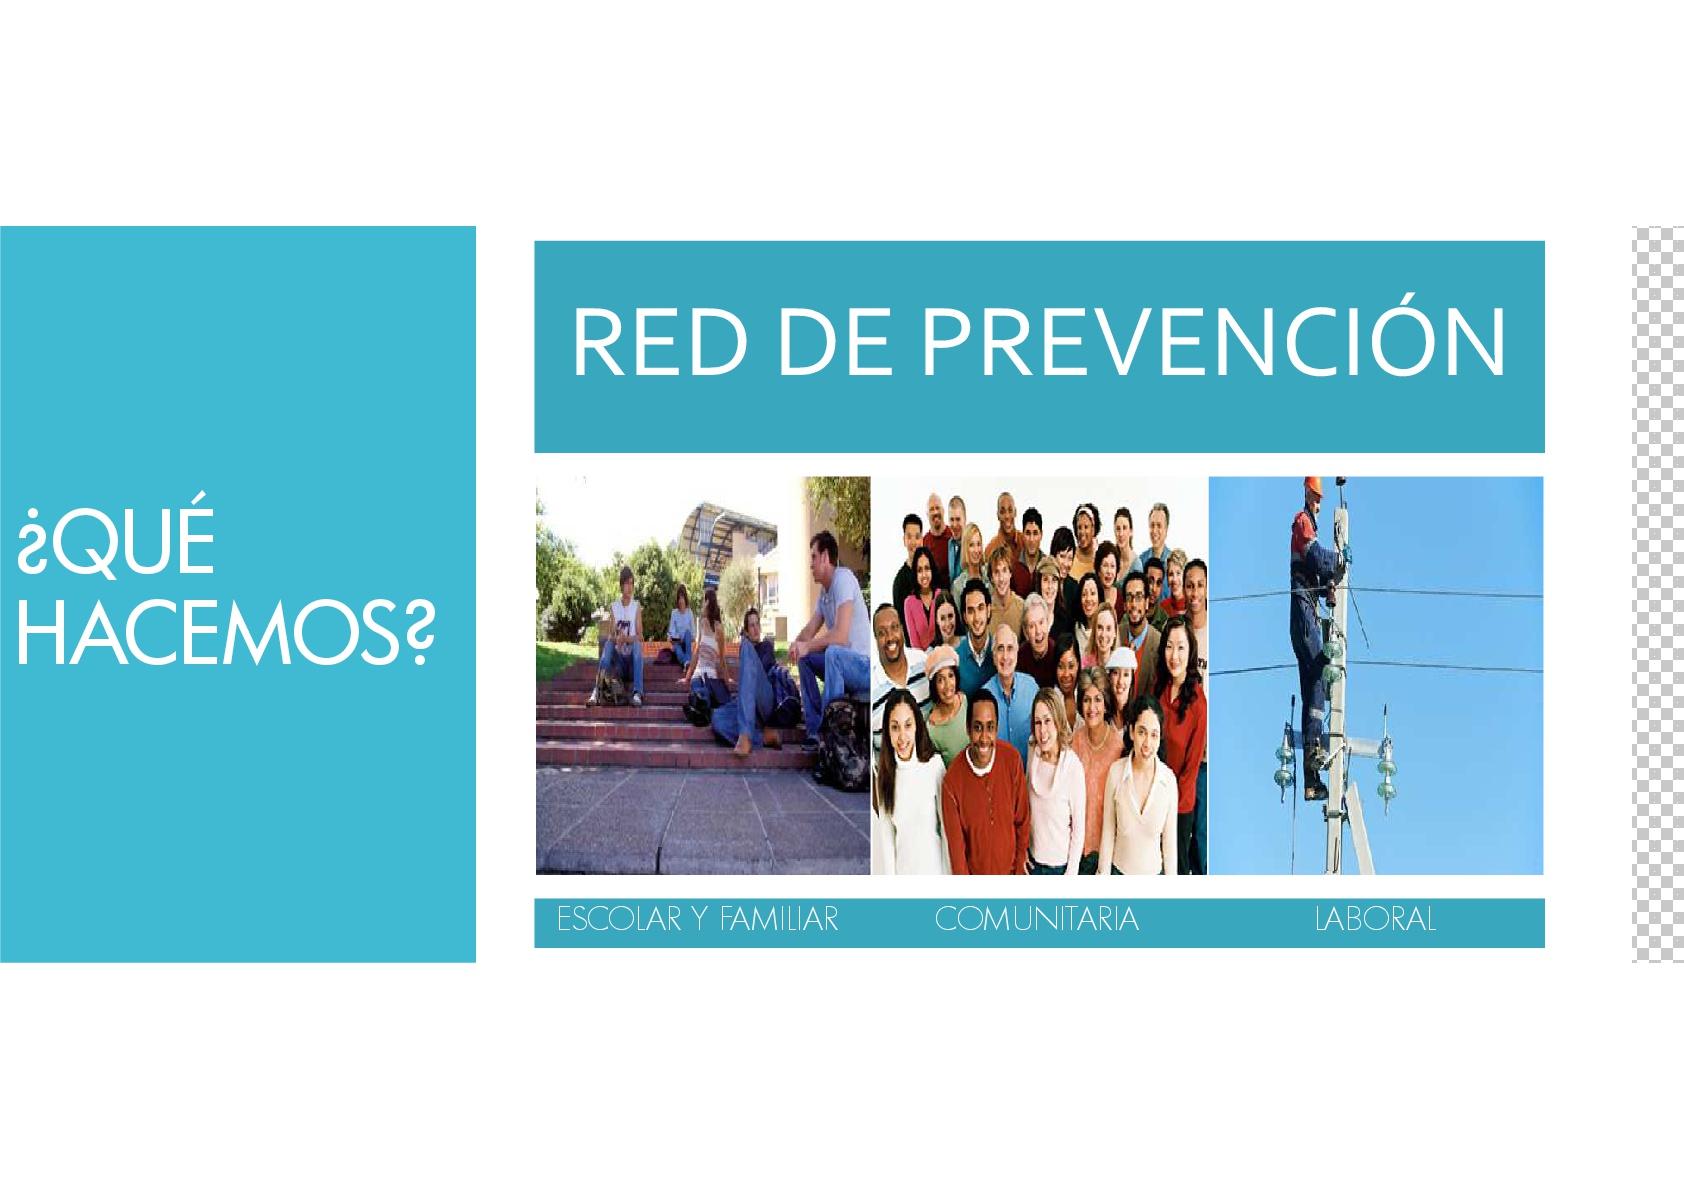 RED DE PREVENCIÓN